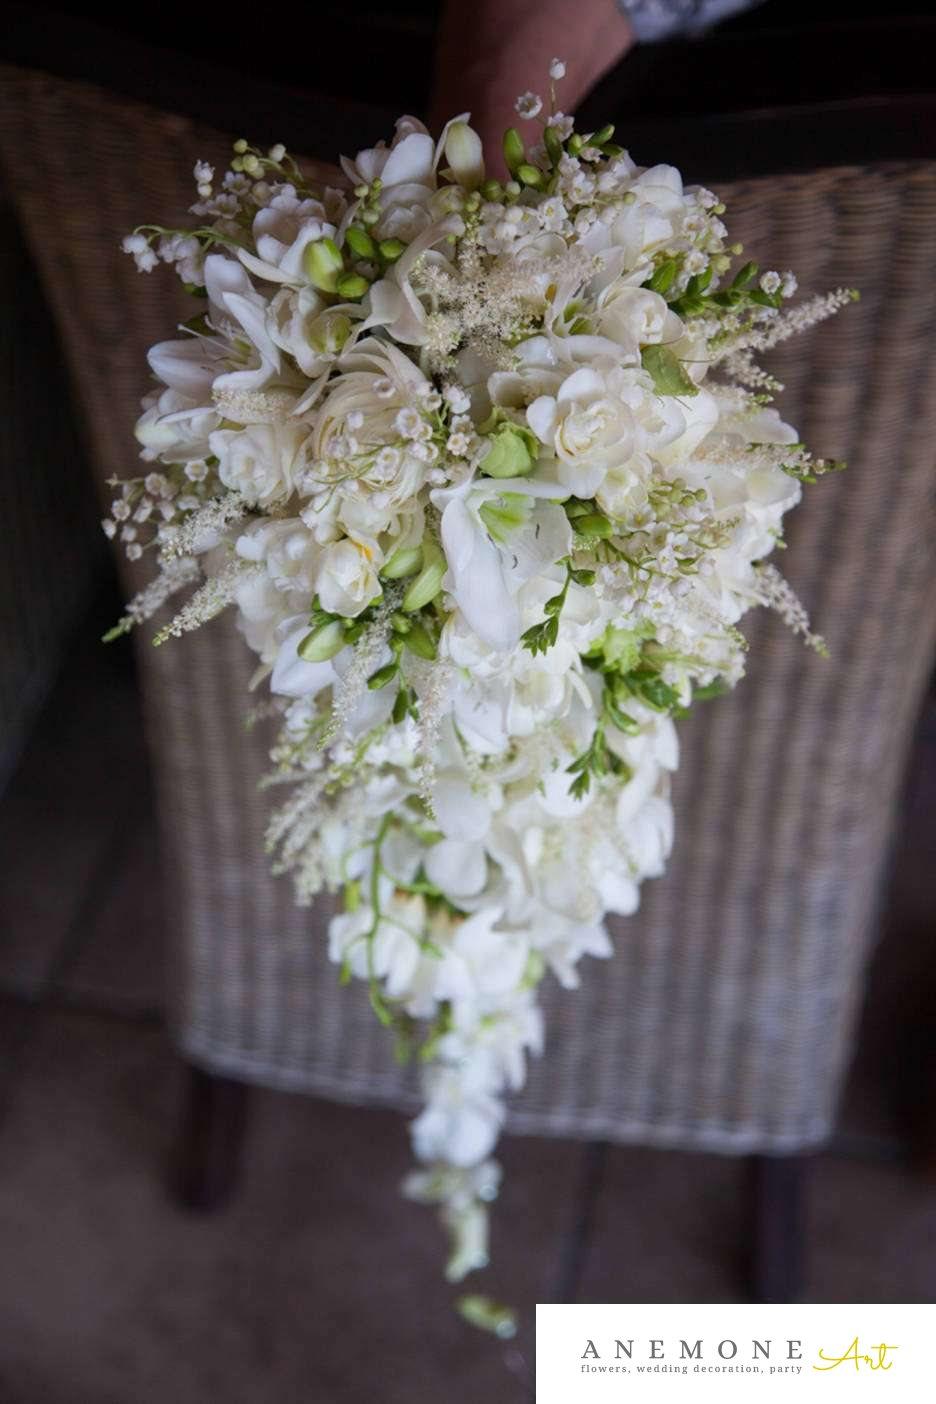 Poza, foto cu Flori de nunta alb, buchet mireasa, curgator, frezii, lacrimioare, lisianthus, orhidee in Arad, Timisoara, Oradea (wedding flowers, bouquets) nunta Arad, Timisoara, Oradea